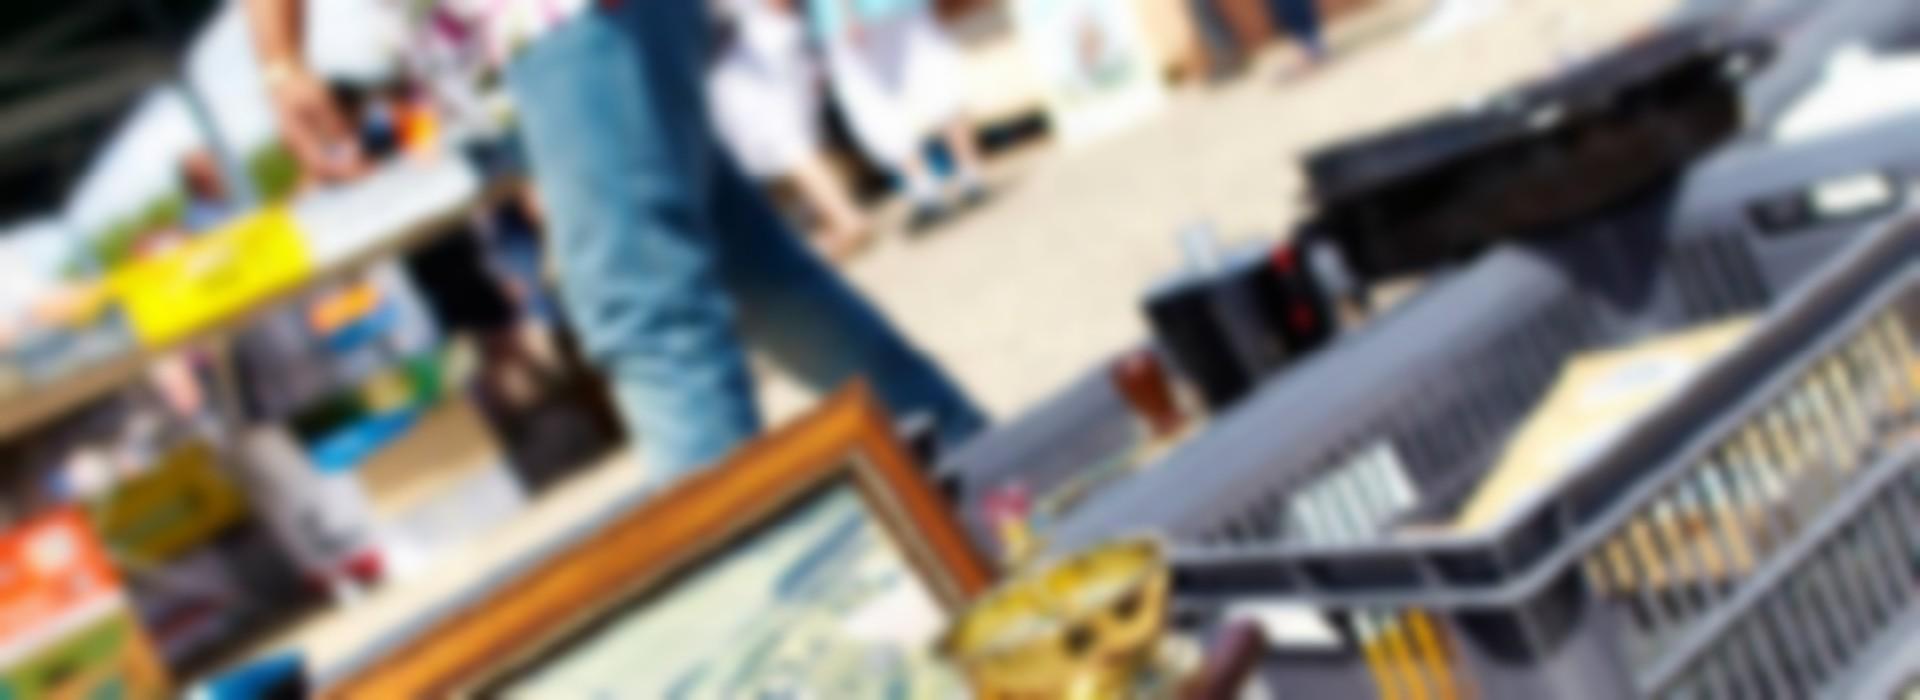 Brocante La Ferte St Aubin vide-grenier 28-06-20: fêtes et manifestations france, pays